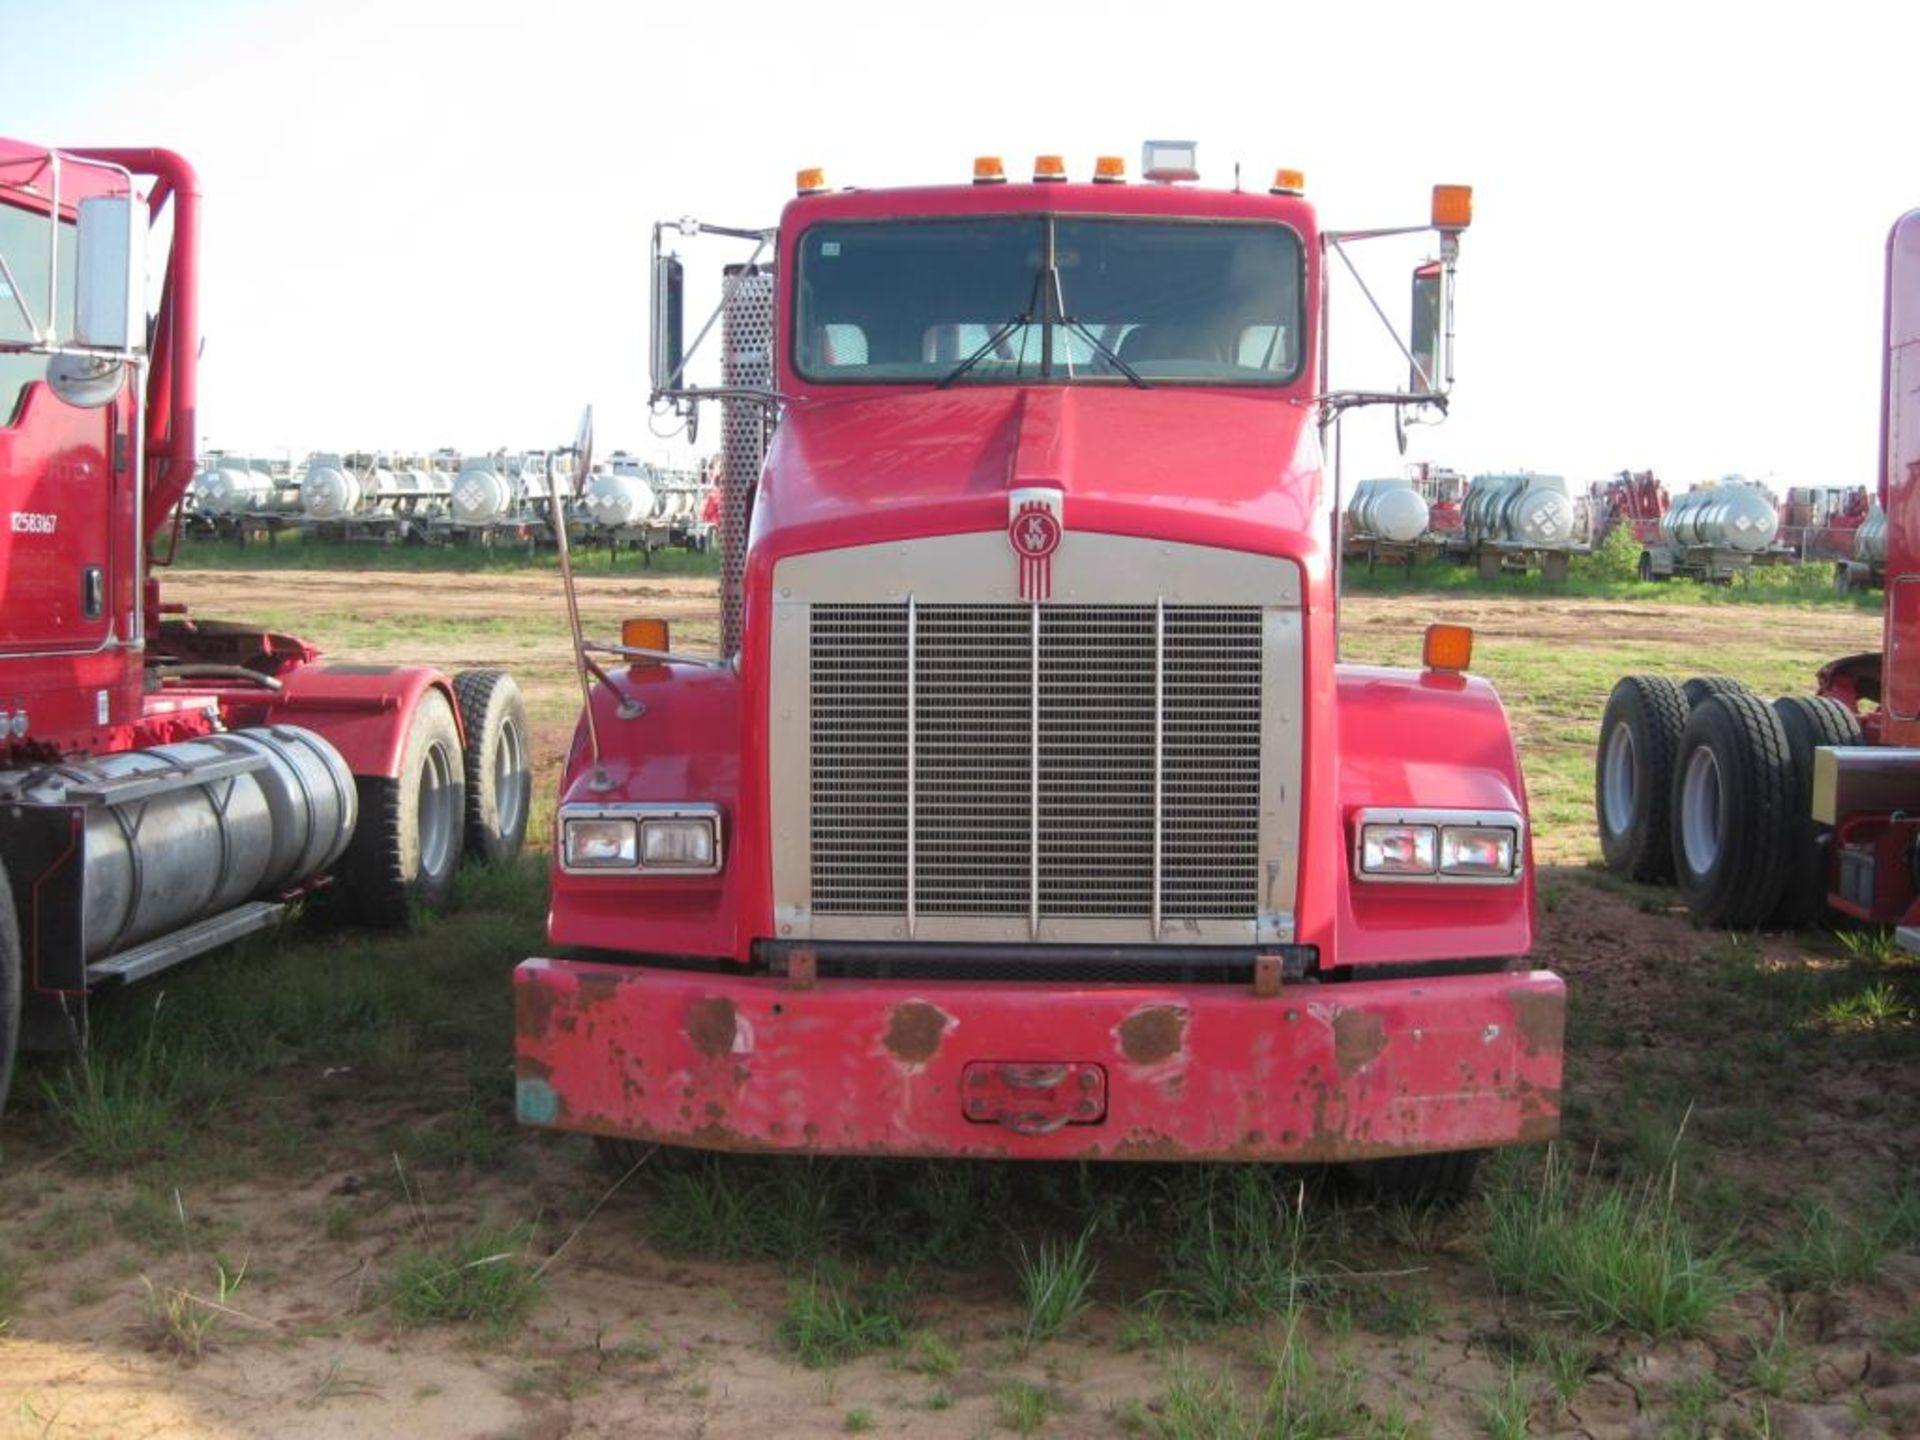 Kenworth Winch Truck - Image 3 of 22